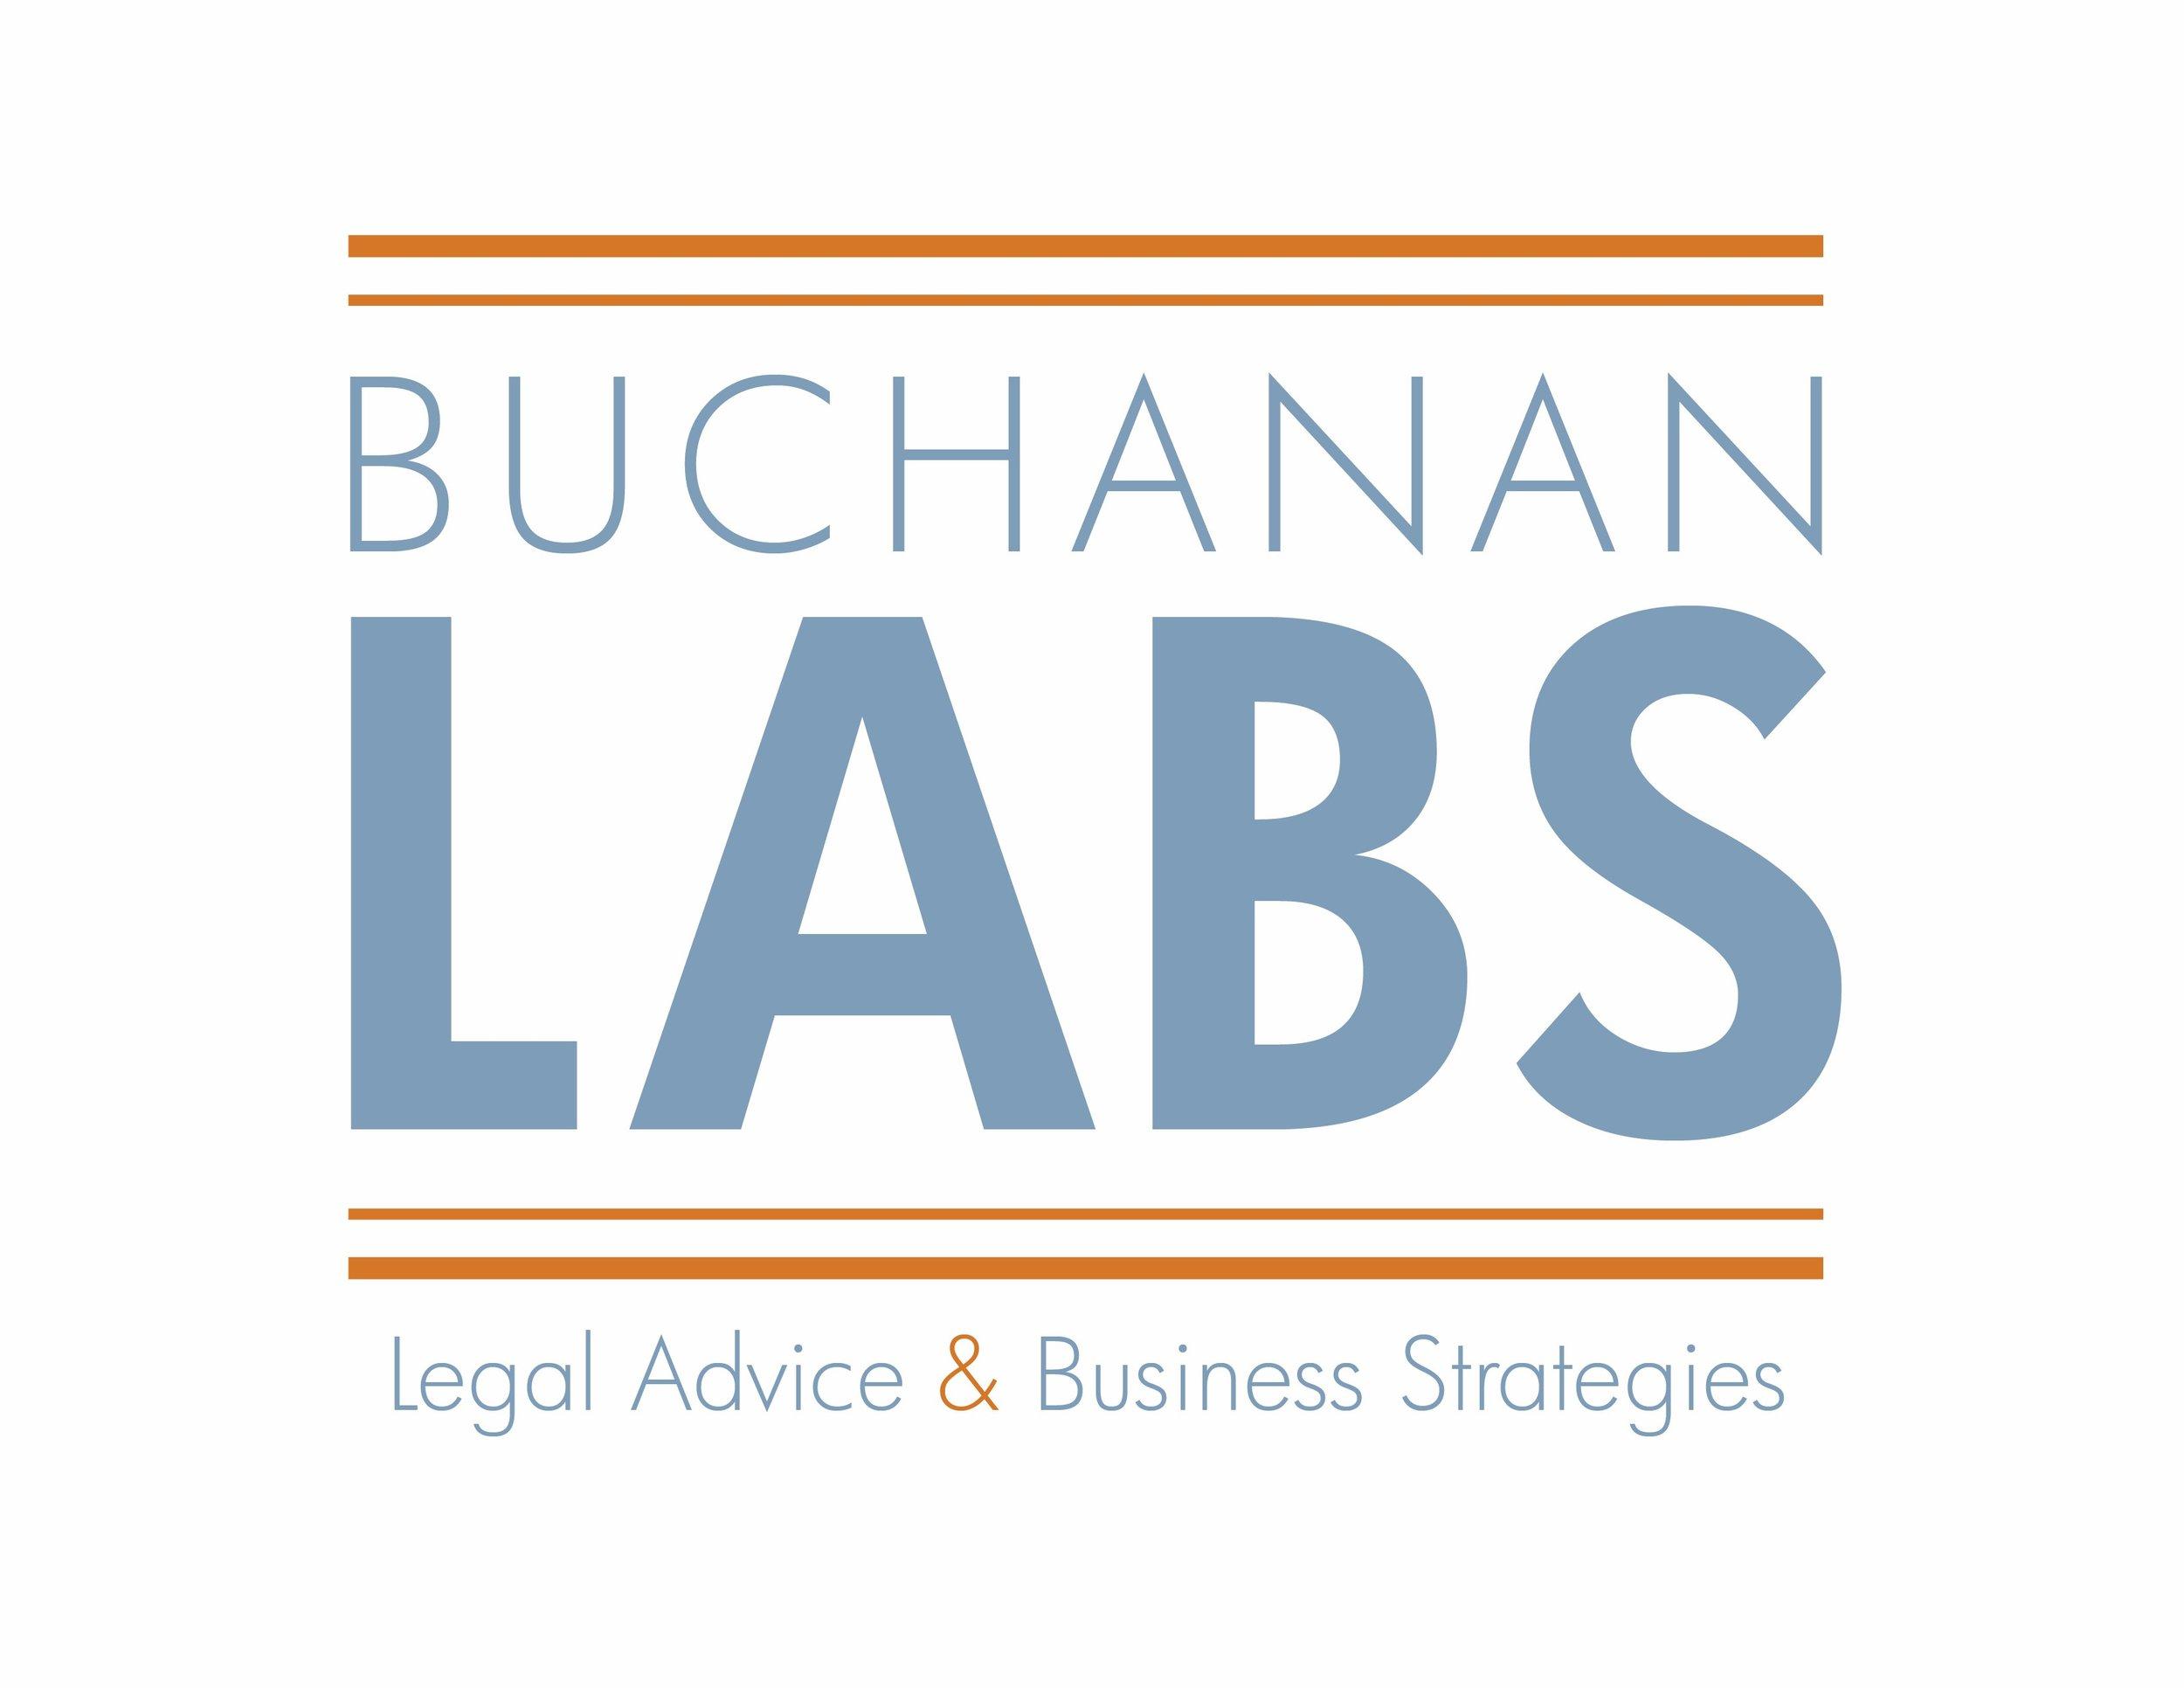 Copy_of_Buchanan_Labs_logo_final-01.jpg